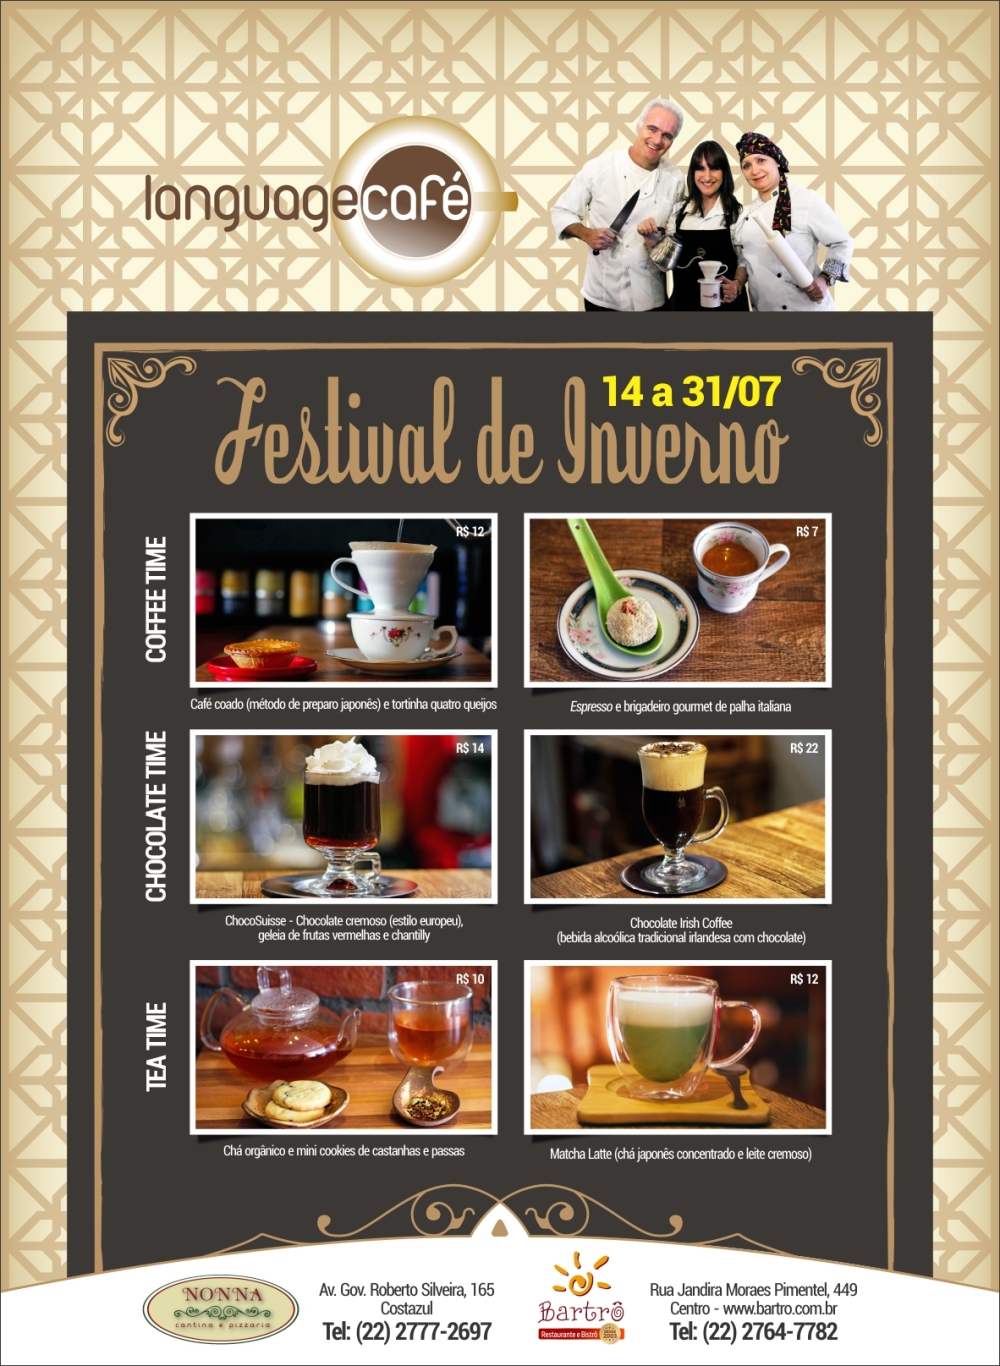 cardapio-a4-languagecafe